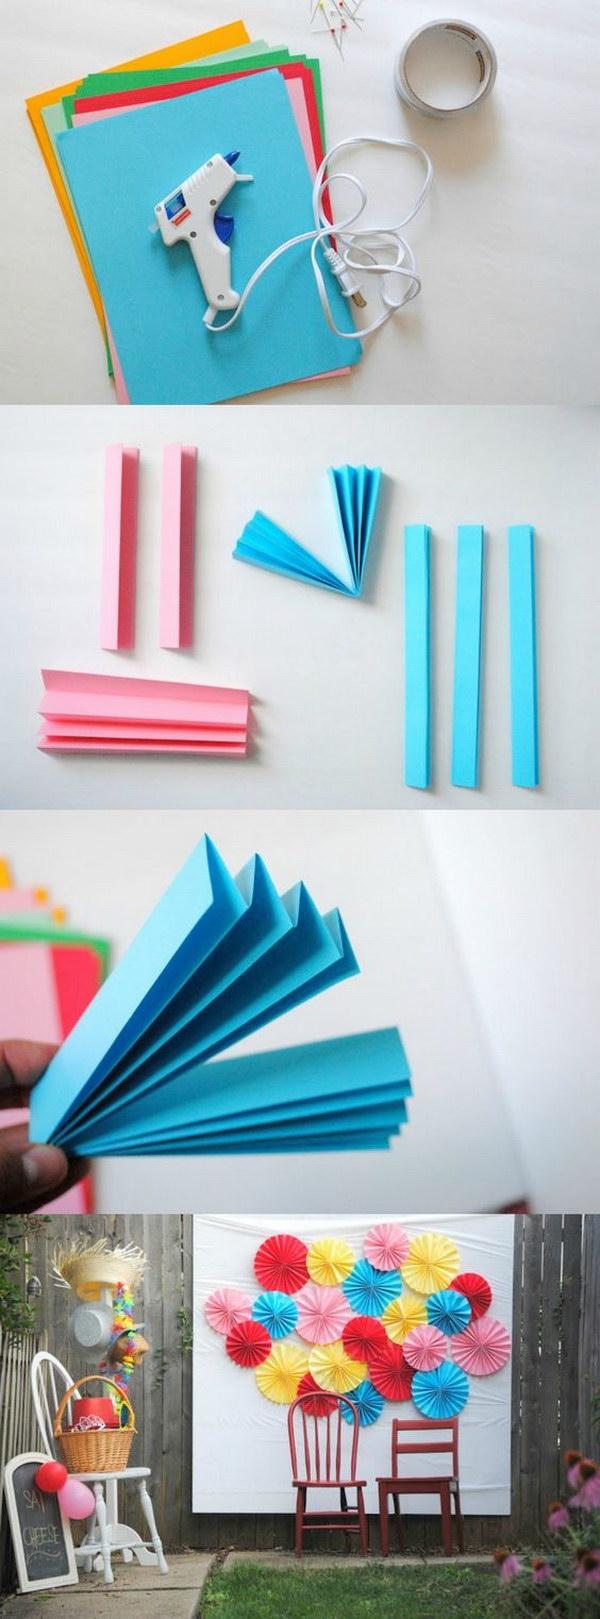 DIY Paper Fan Photo Booth Backdrop